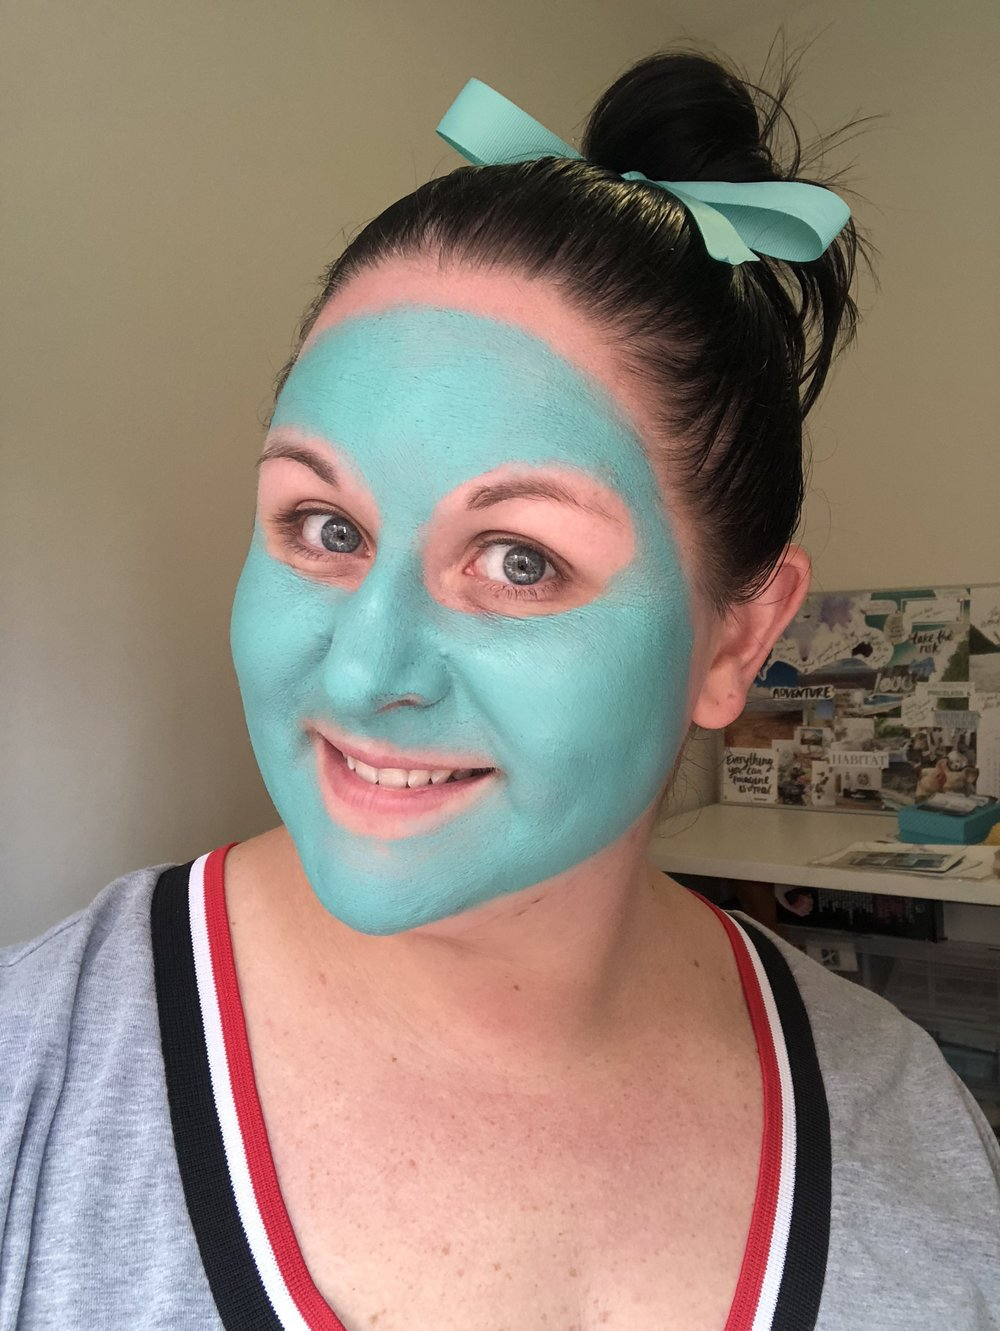 Ole Henriksen Cool Plunge Pore Mask Review